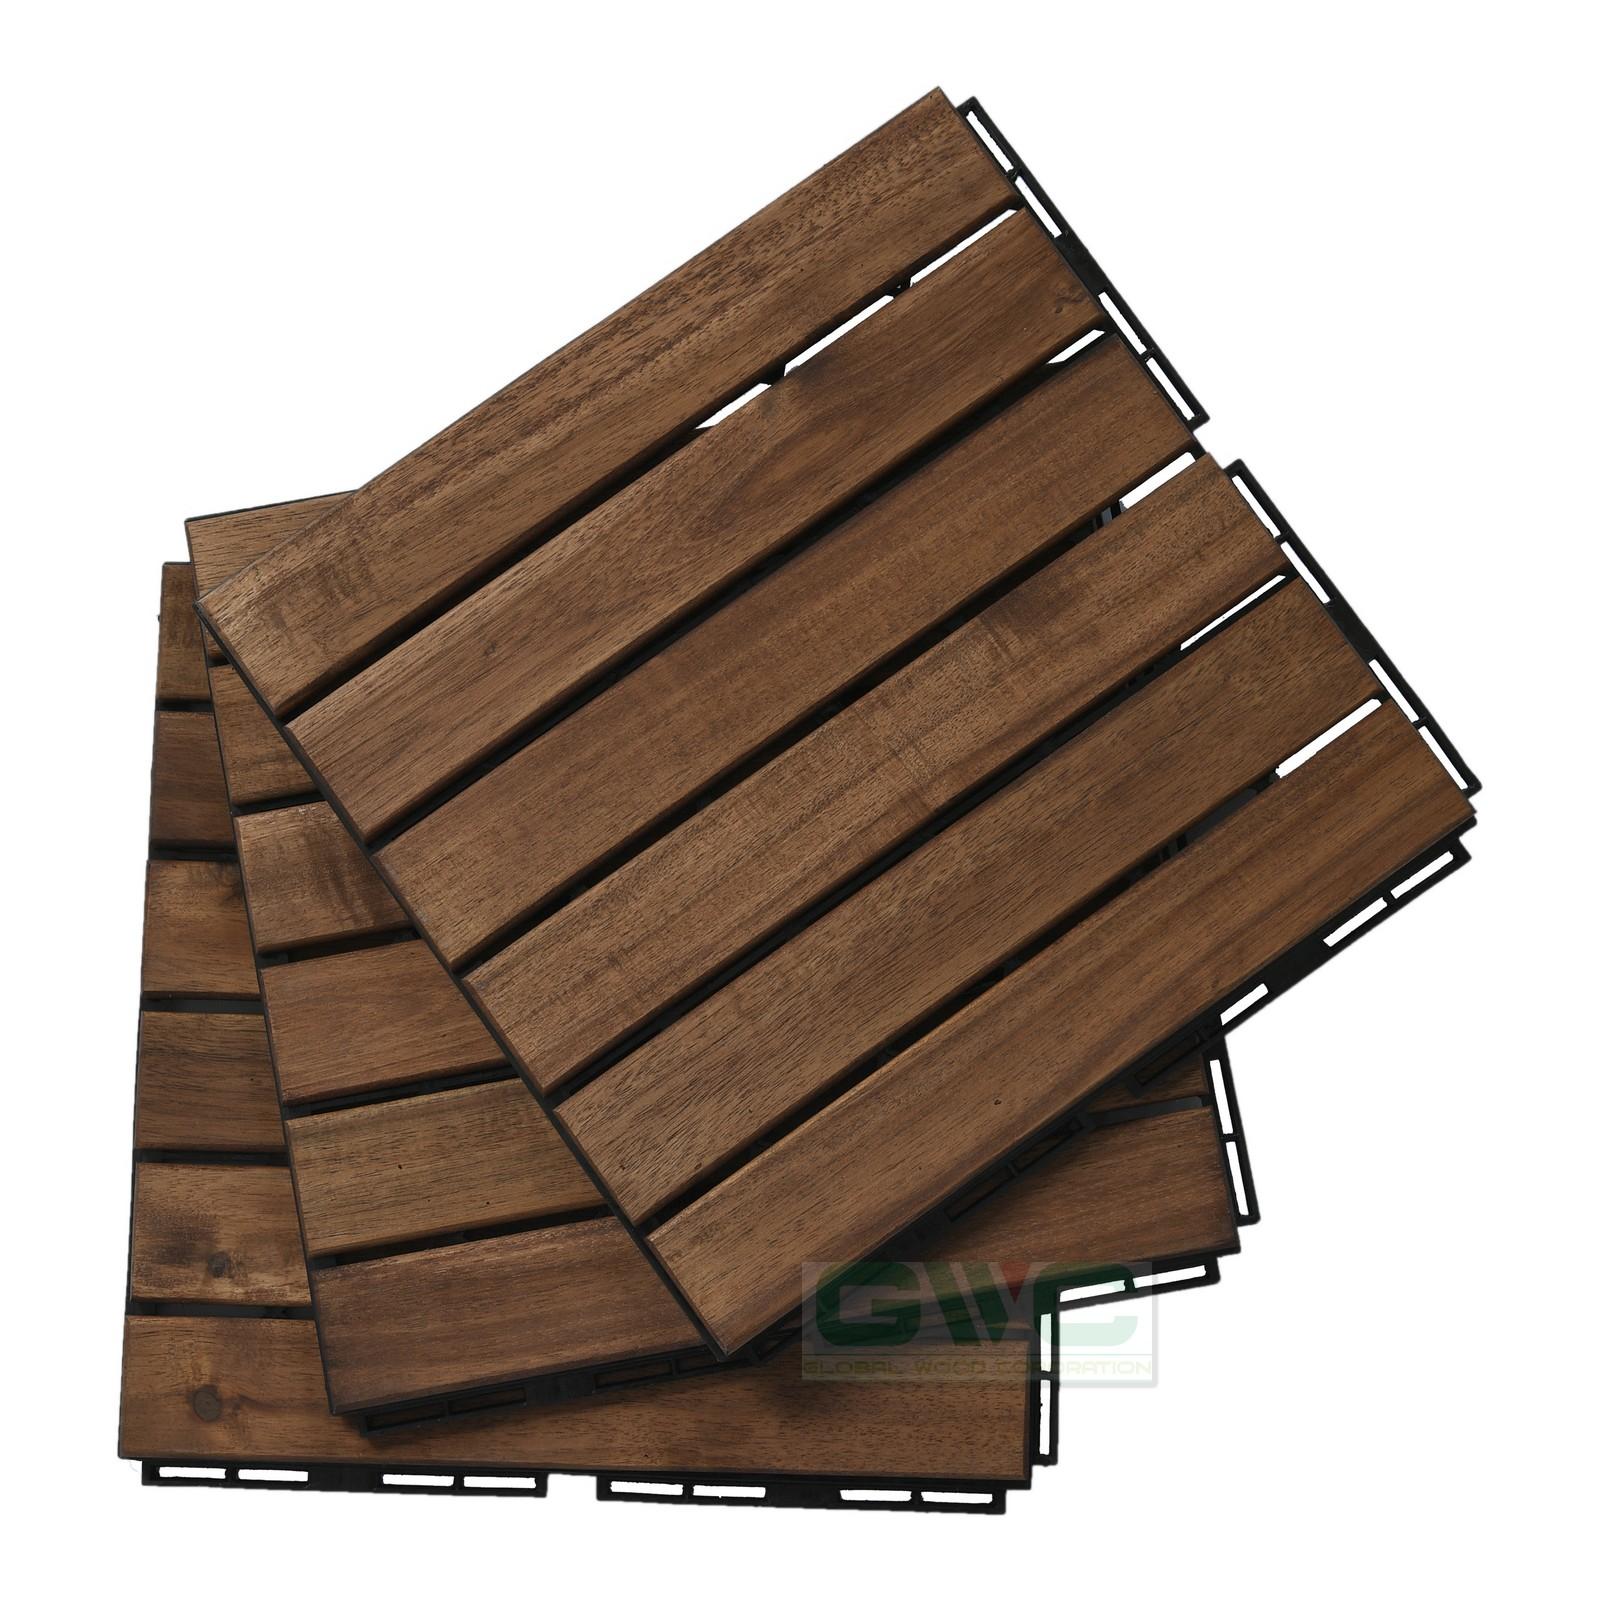 Acacia Wood interlocking Deck Tile 6 slats